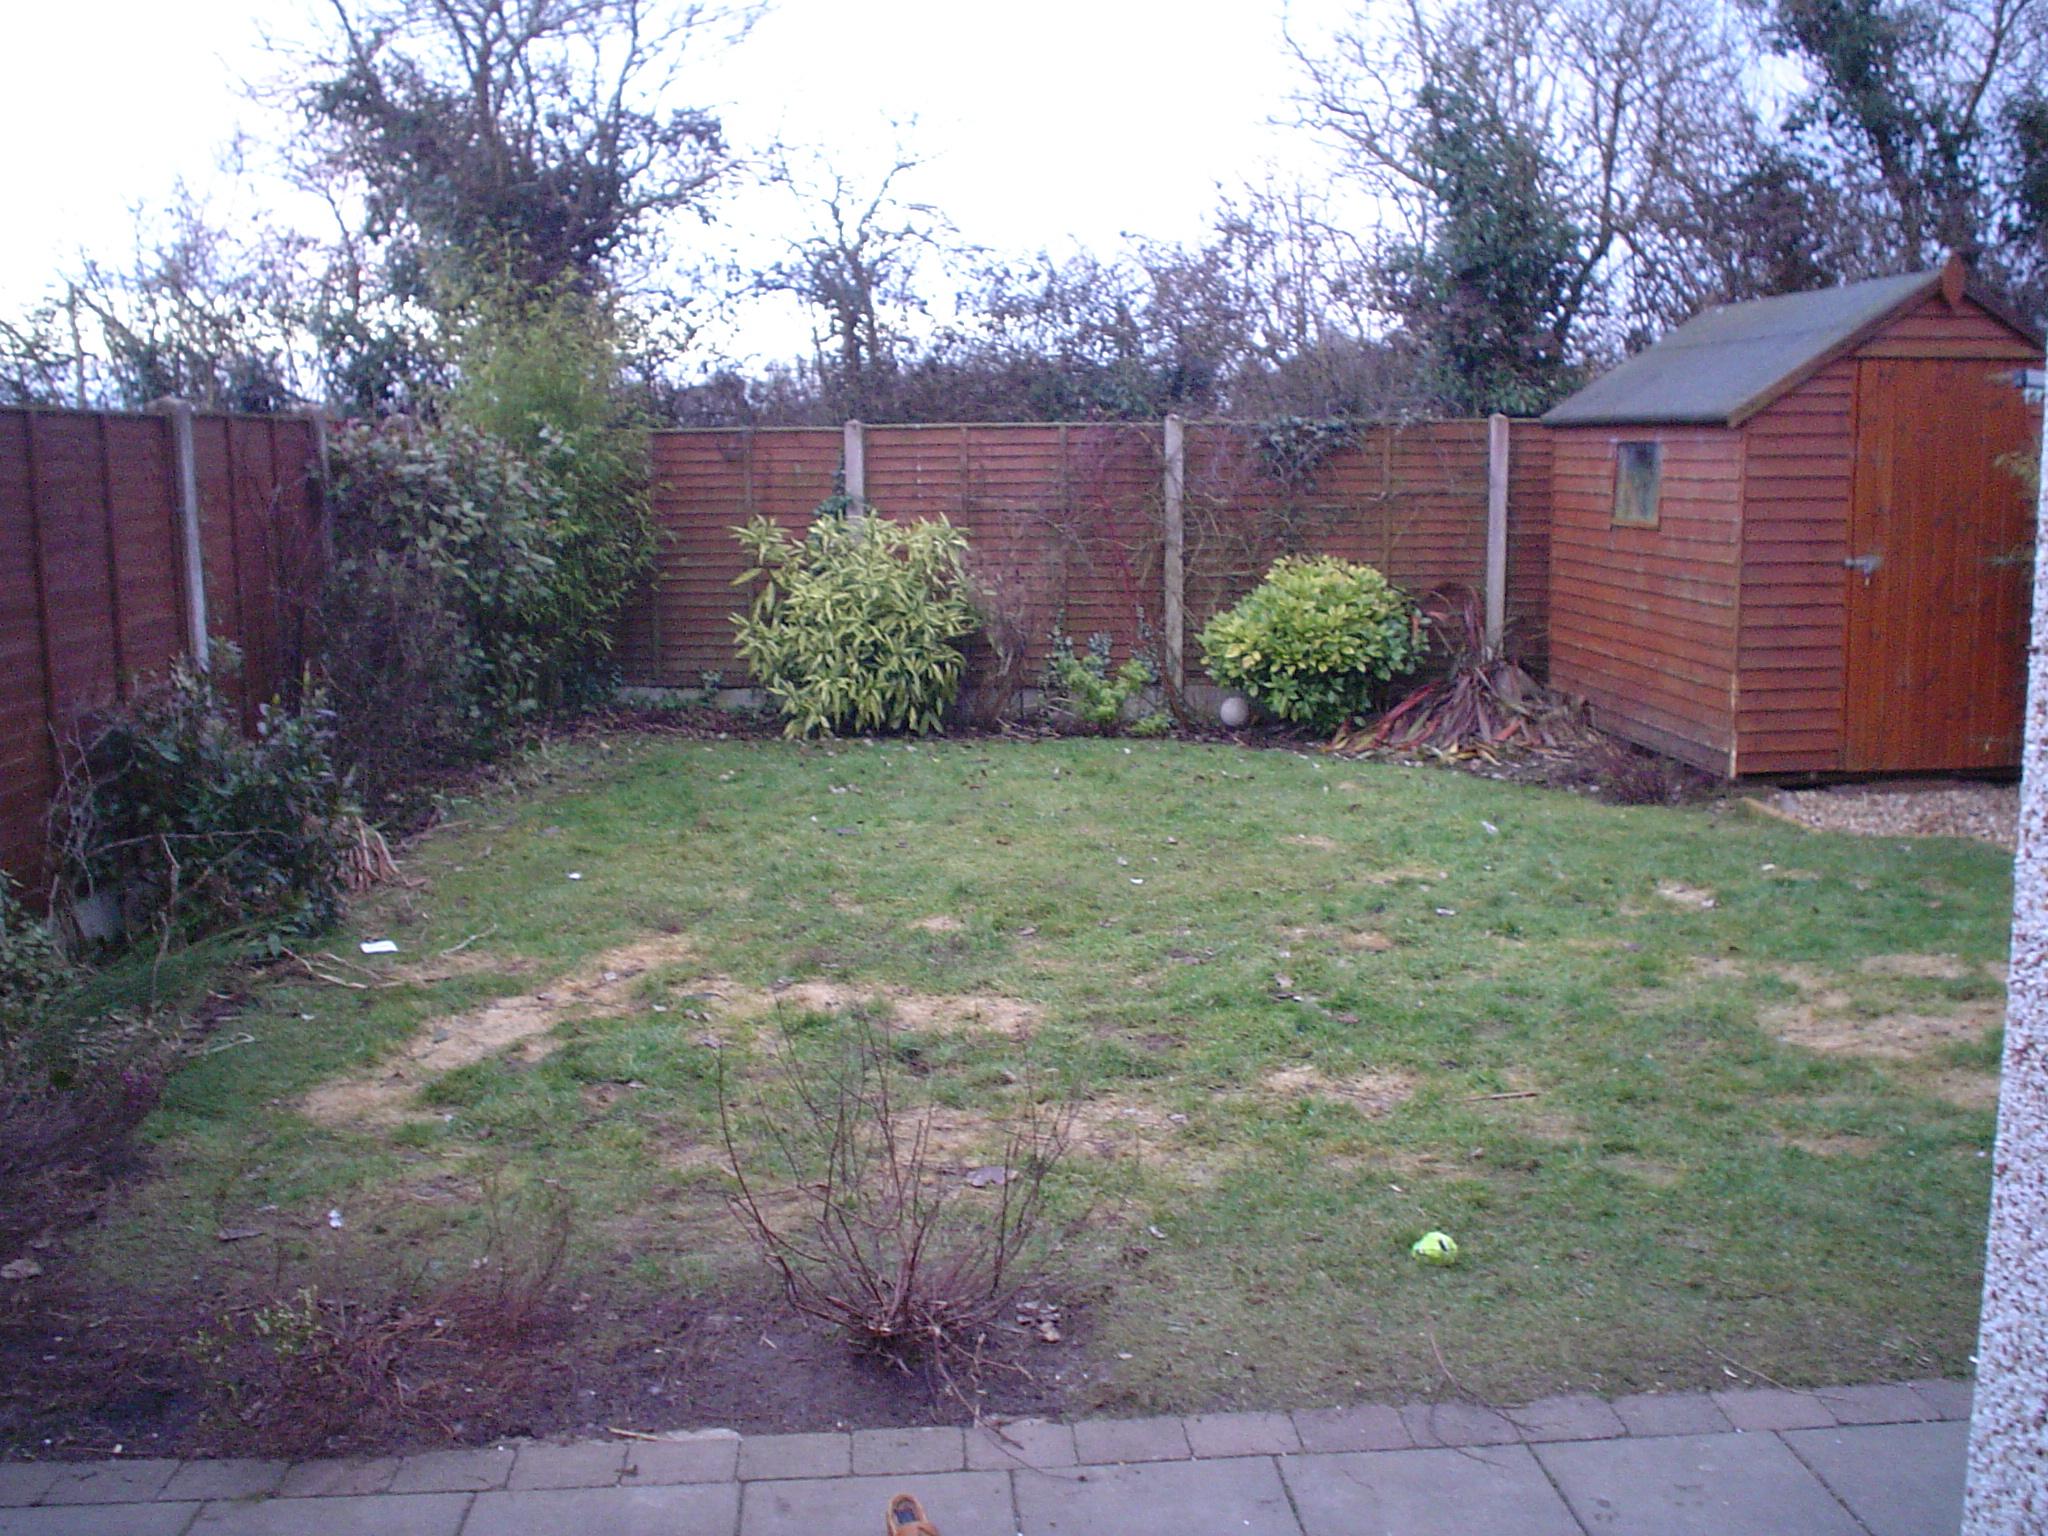 Pvt. Garden, Kildare - Before